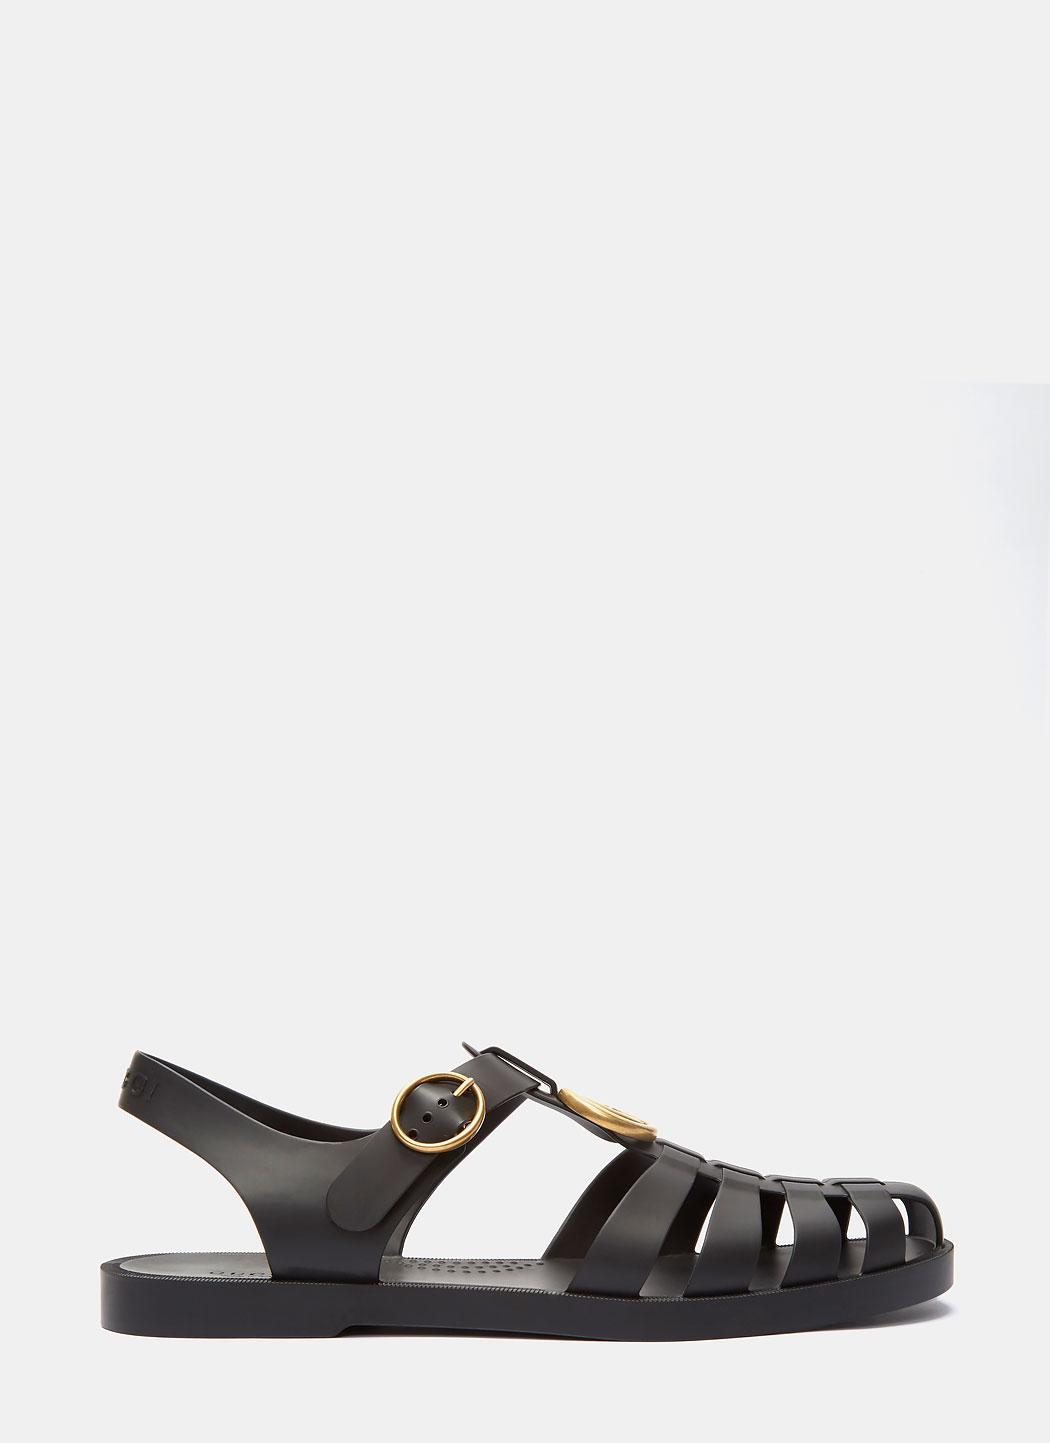 35975d45446 Lyst - Gucci Men s Tiger Head Rubber Buckle Sandals In Black in Black